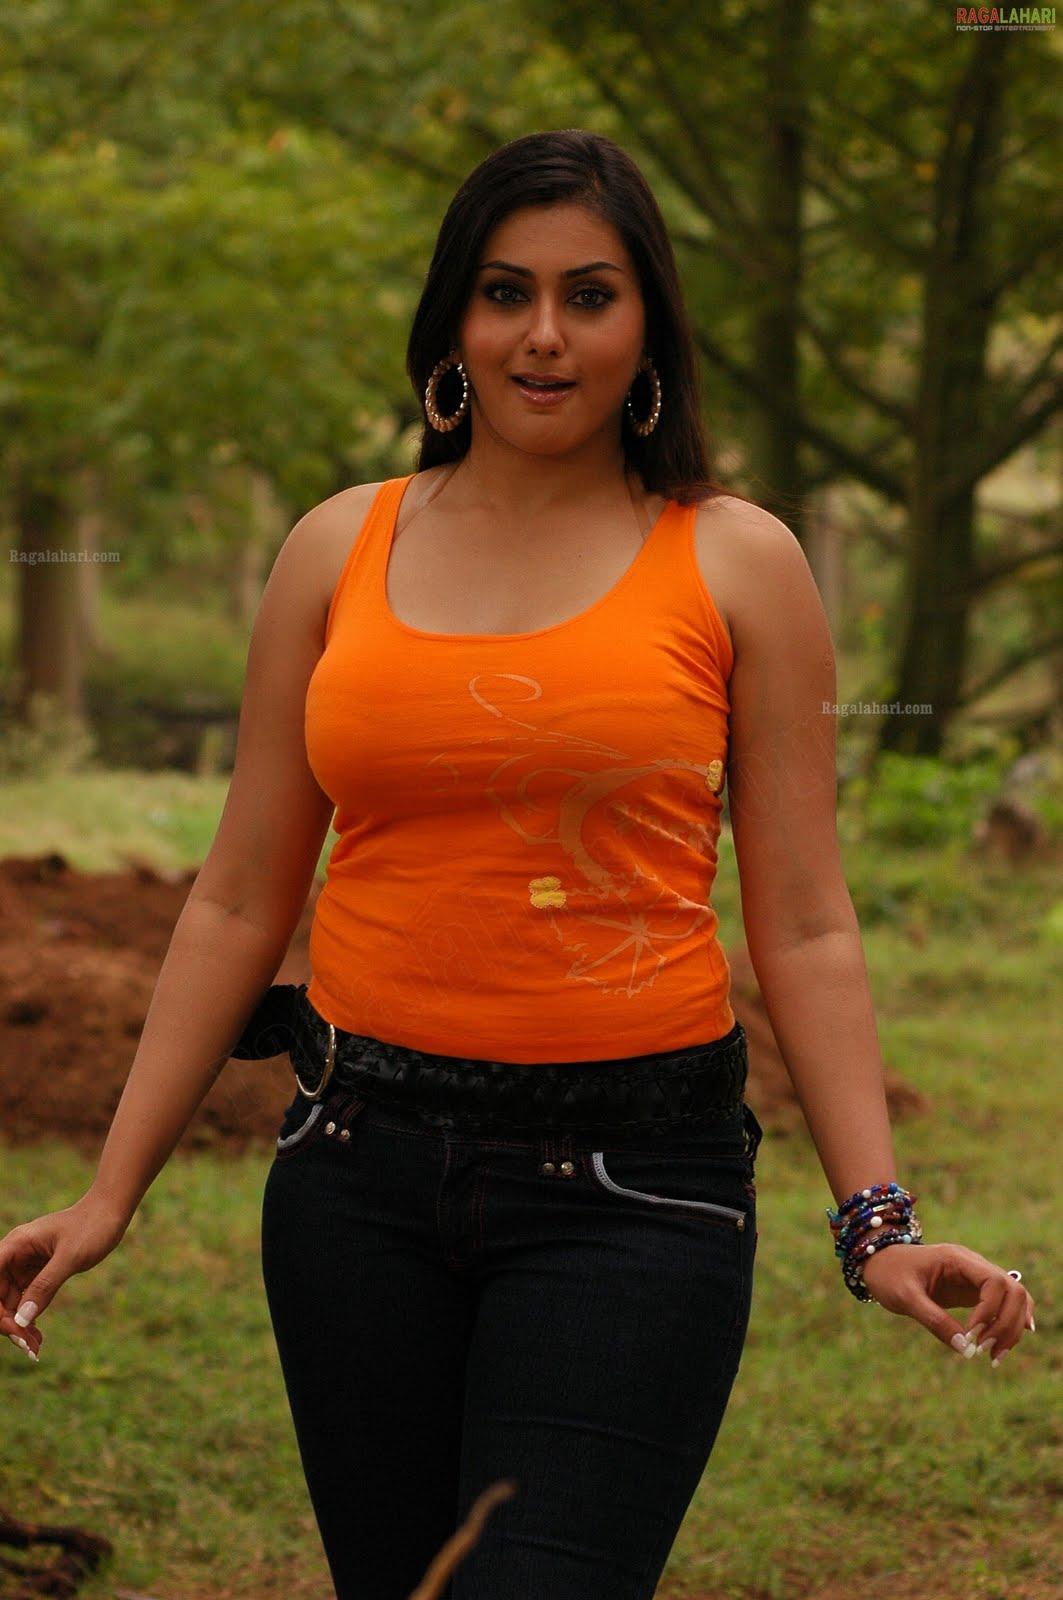 hot namitha stills: Namitha hot